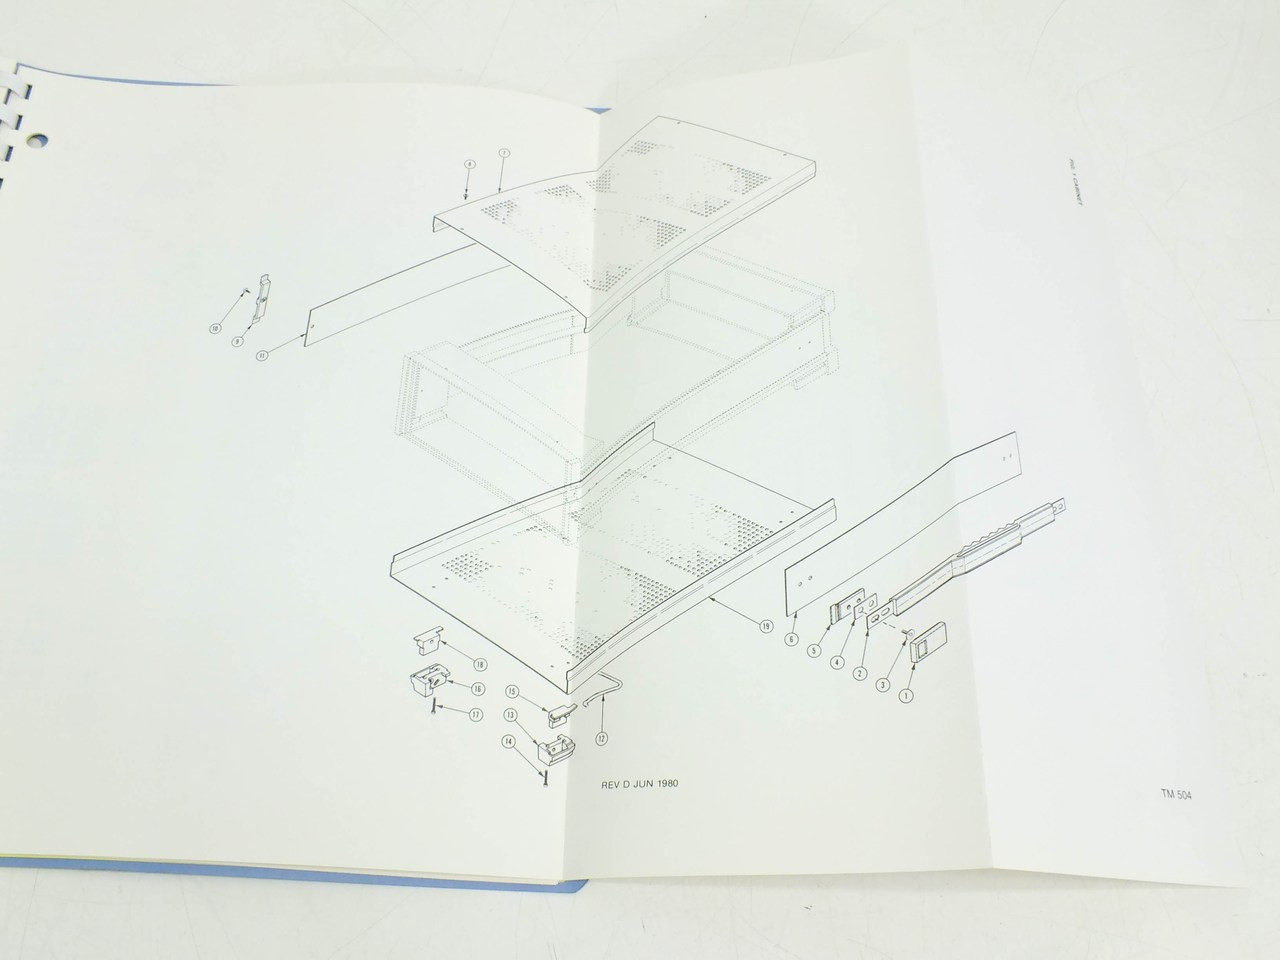 Tektronix TM504 Power Module Instruction Manual 070-1716